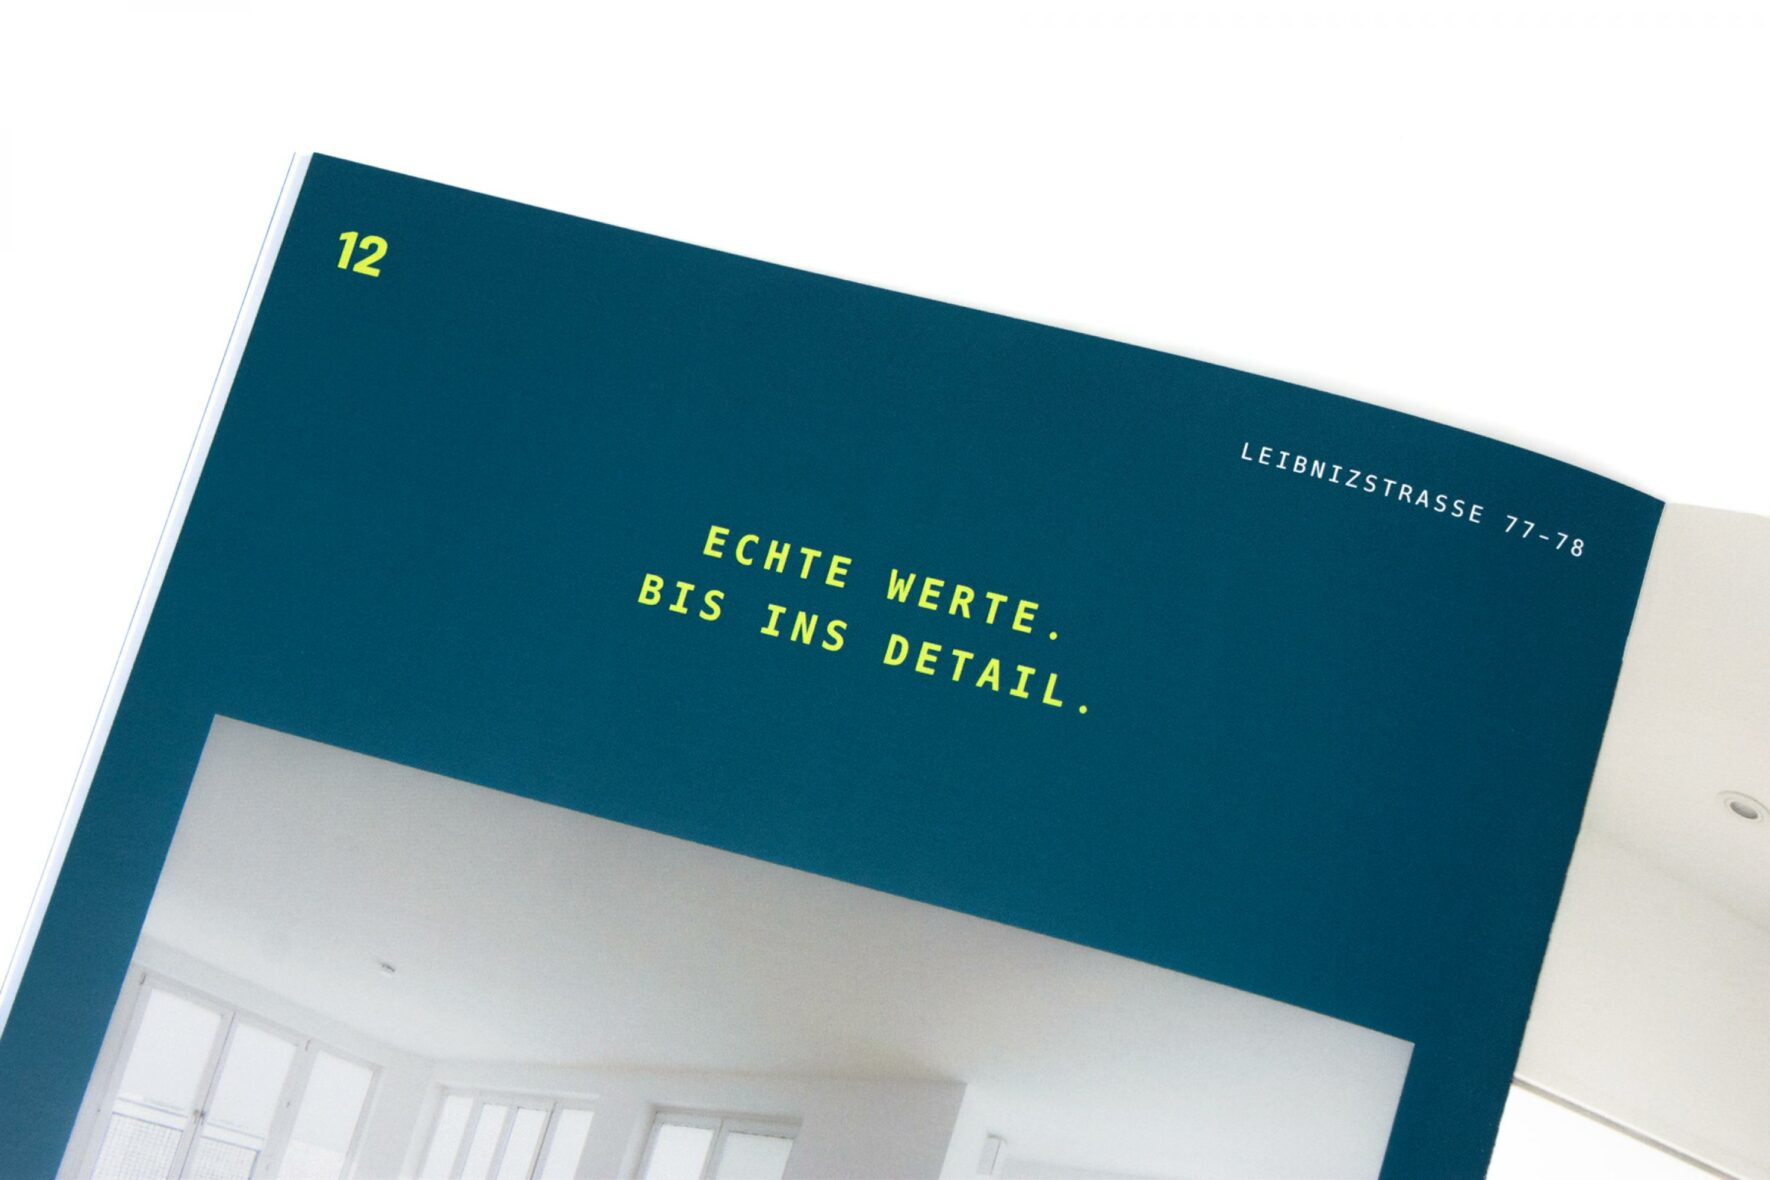 Broschuere-Leibniz-Immobilienbranding-Trendcity-FORMLOS-berlin-Print83